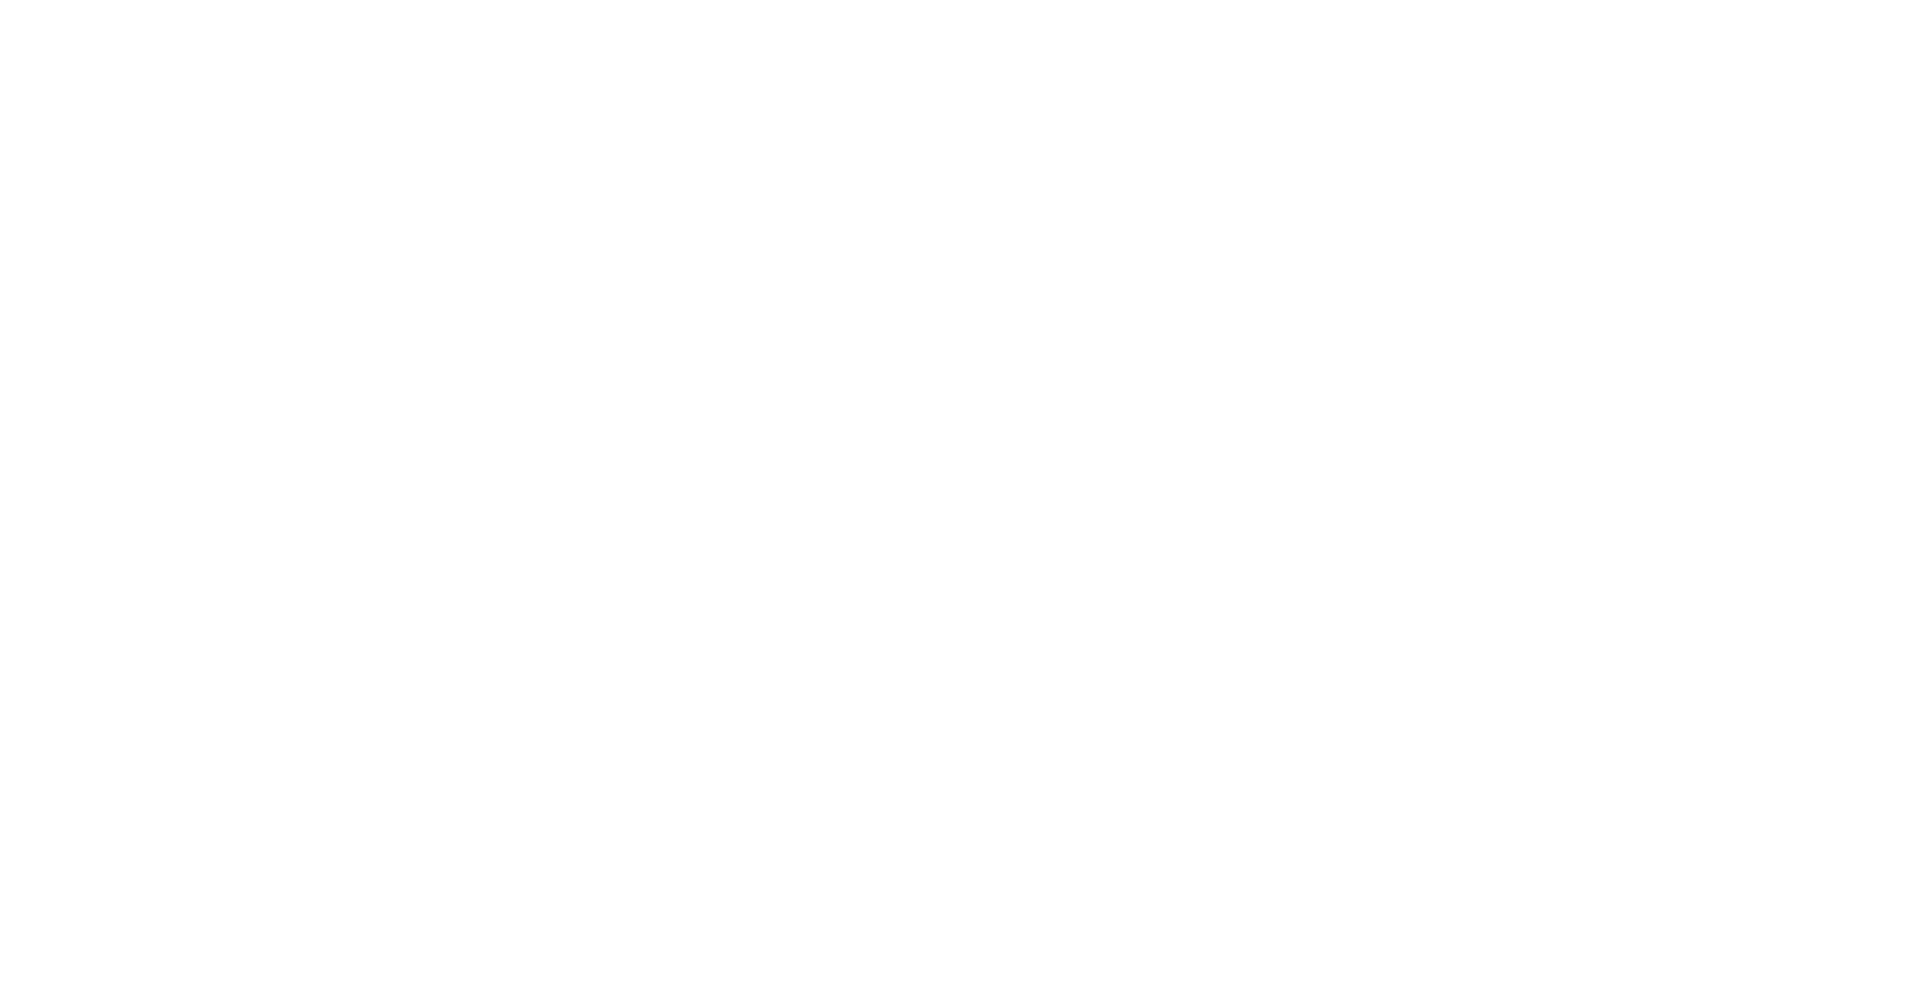 Creato location map shadow effect